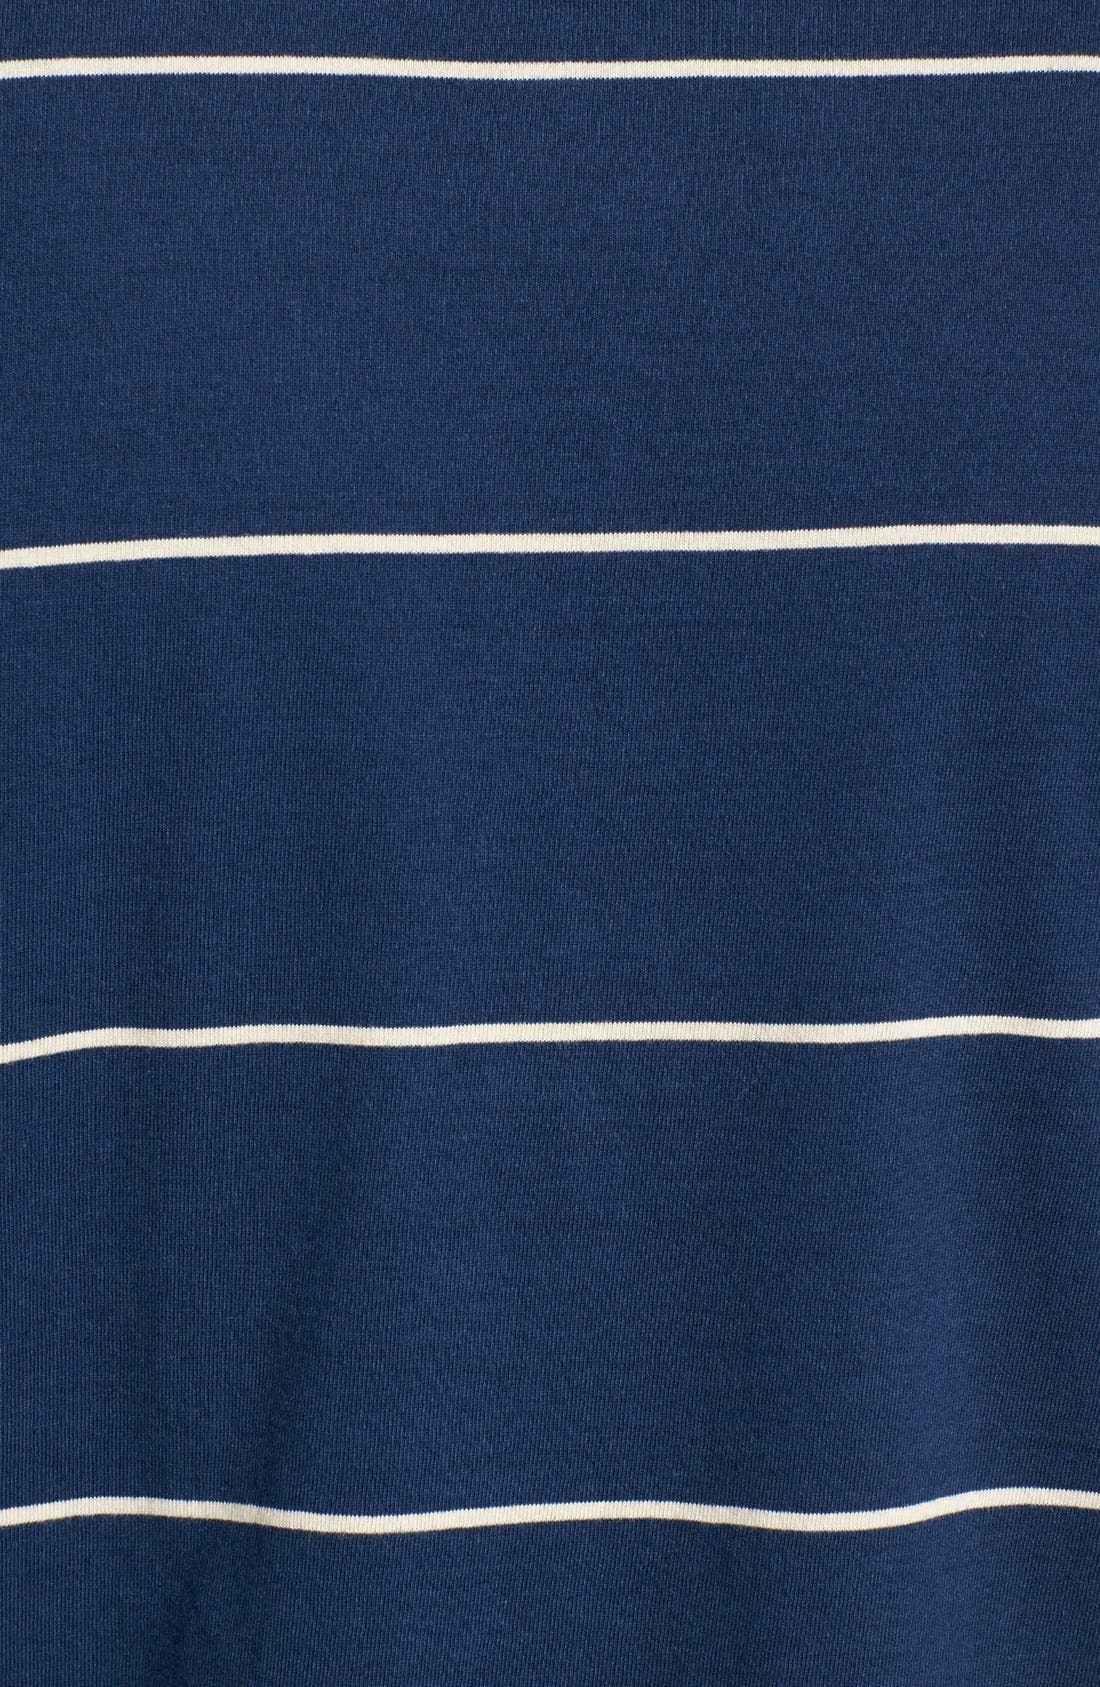 Alternate Image 3  - Obey 'Westchester' Stripe Jersey Henley